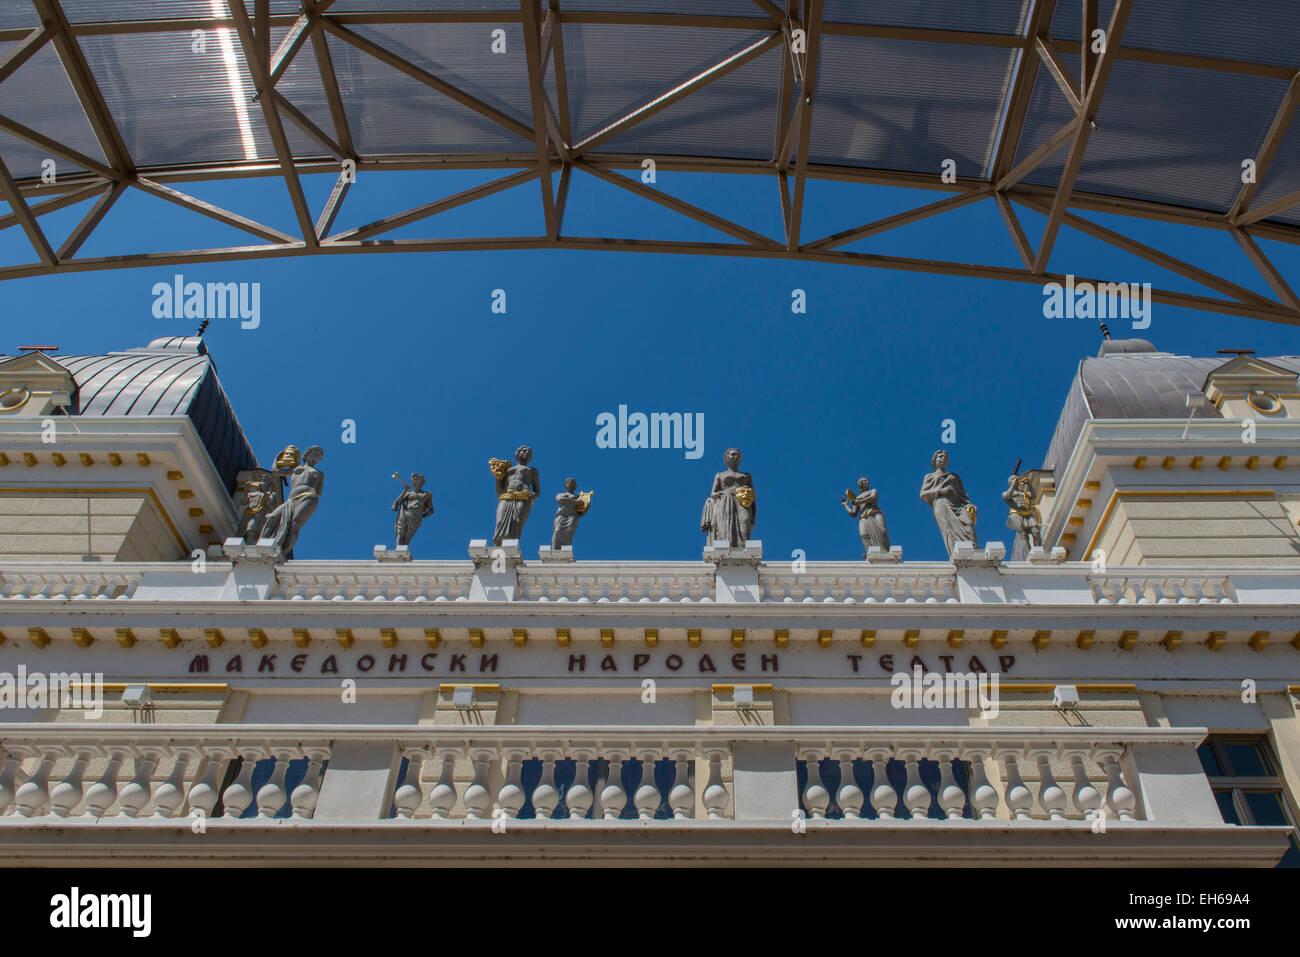 Facade Of Macedonian National Theatre, Skopje - Stock Image